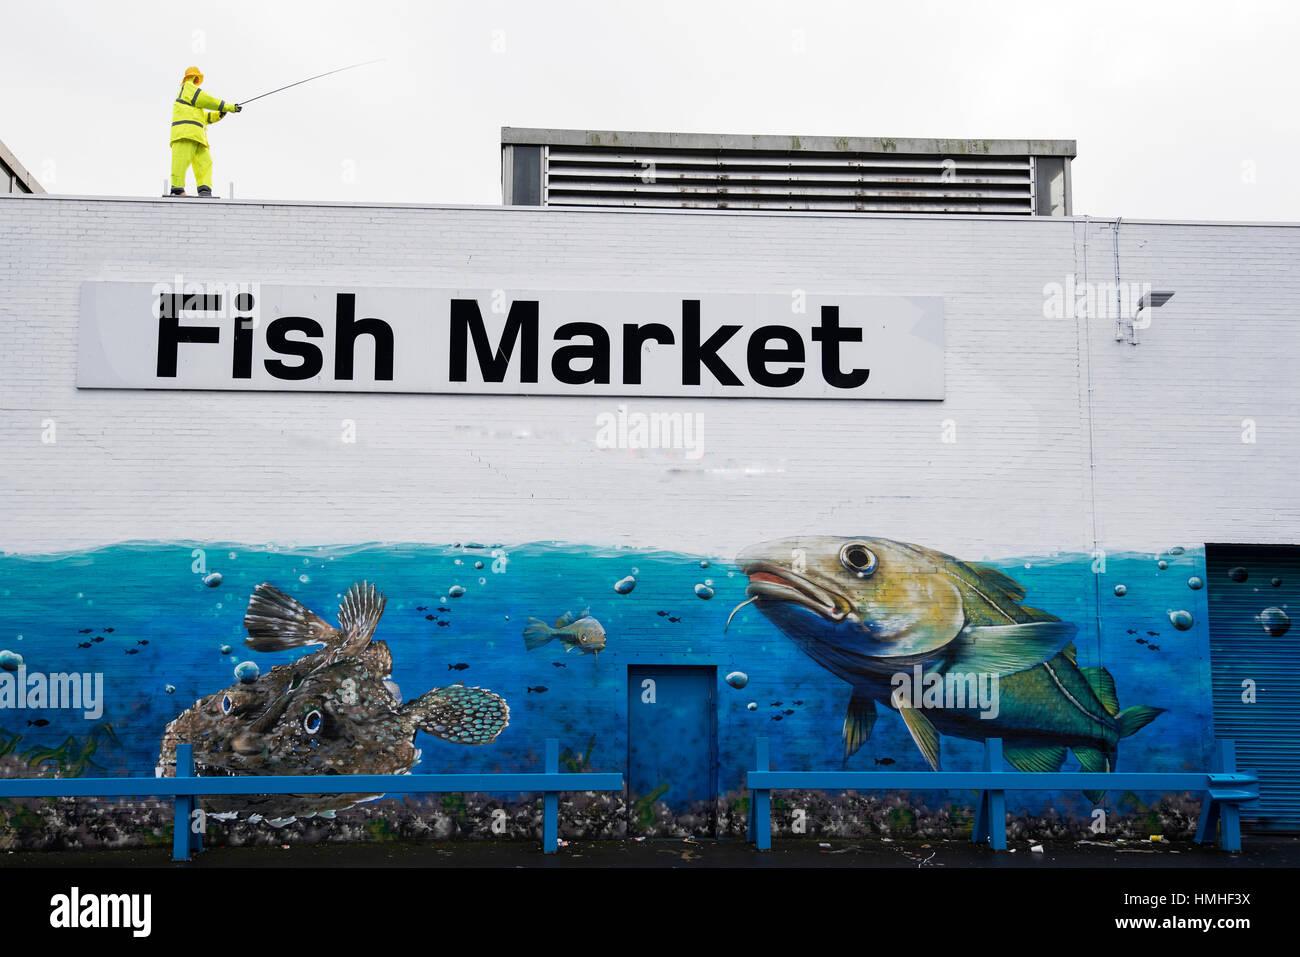 Mural at Glasgow Fish Market - Stock Image